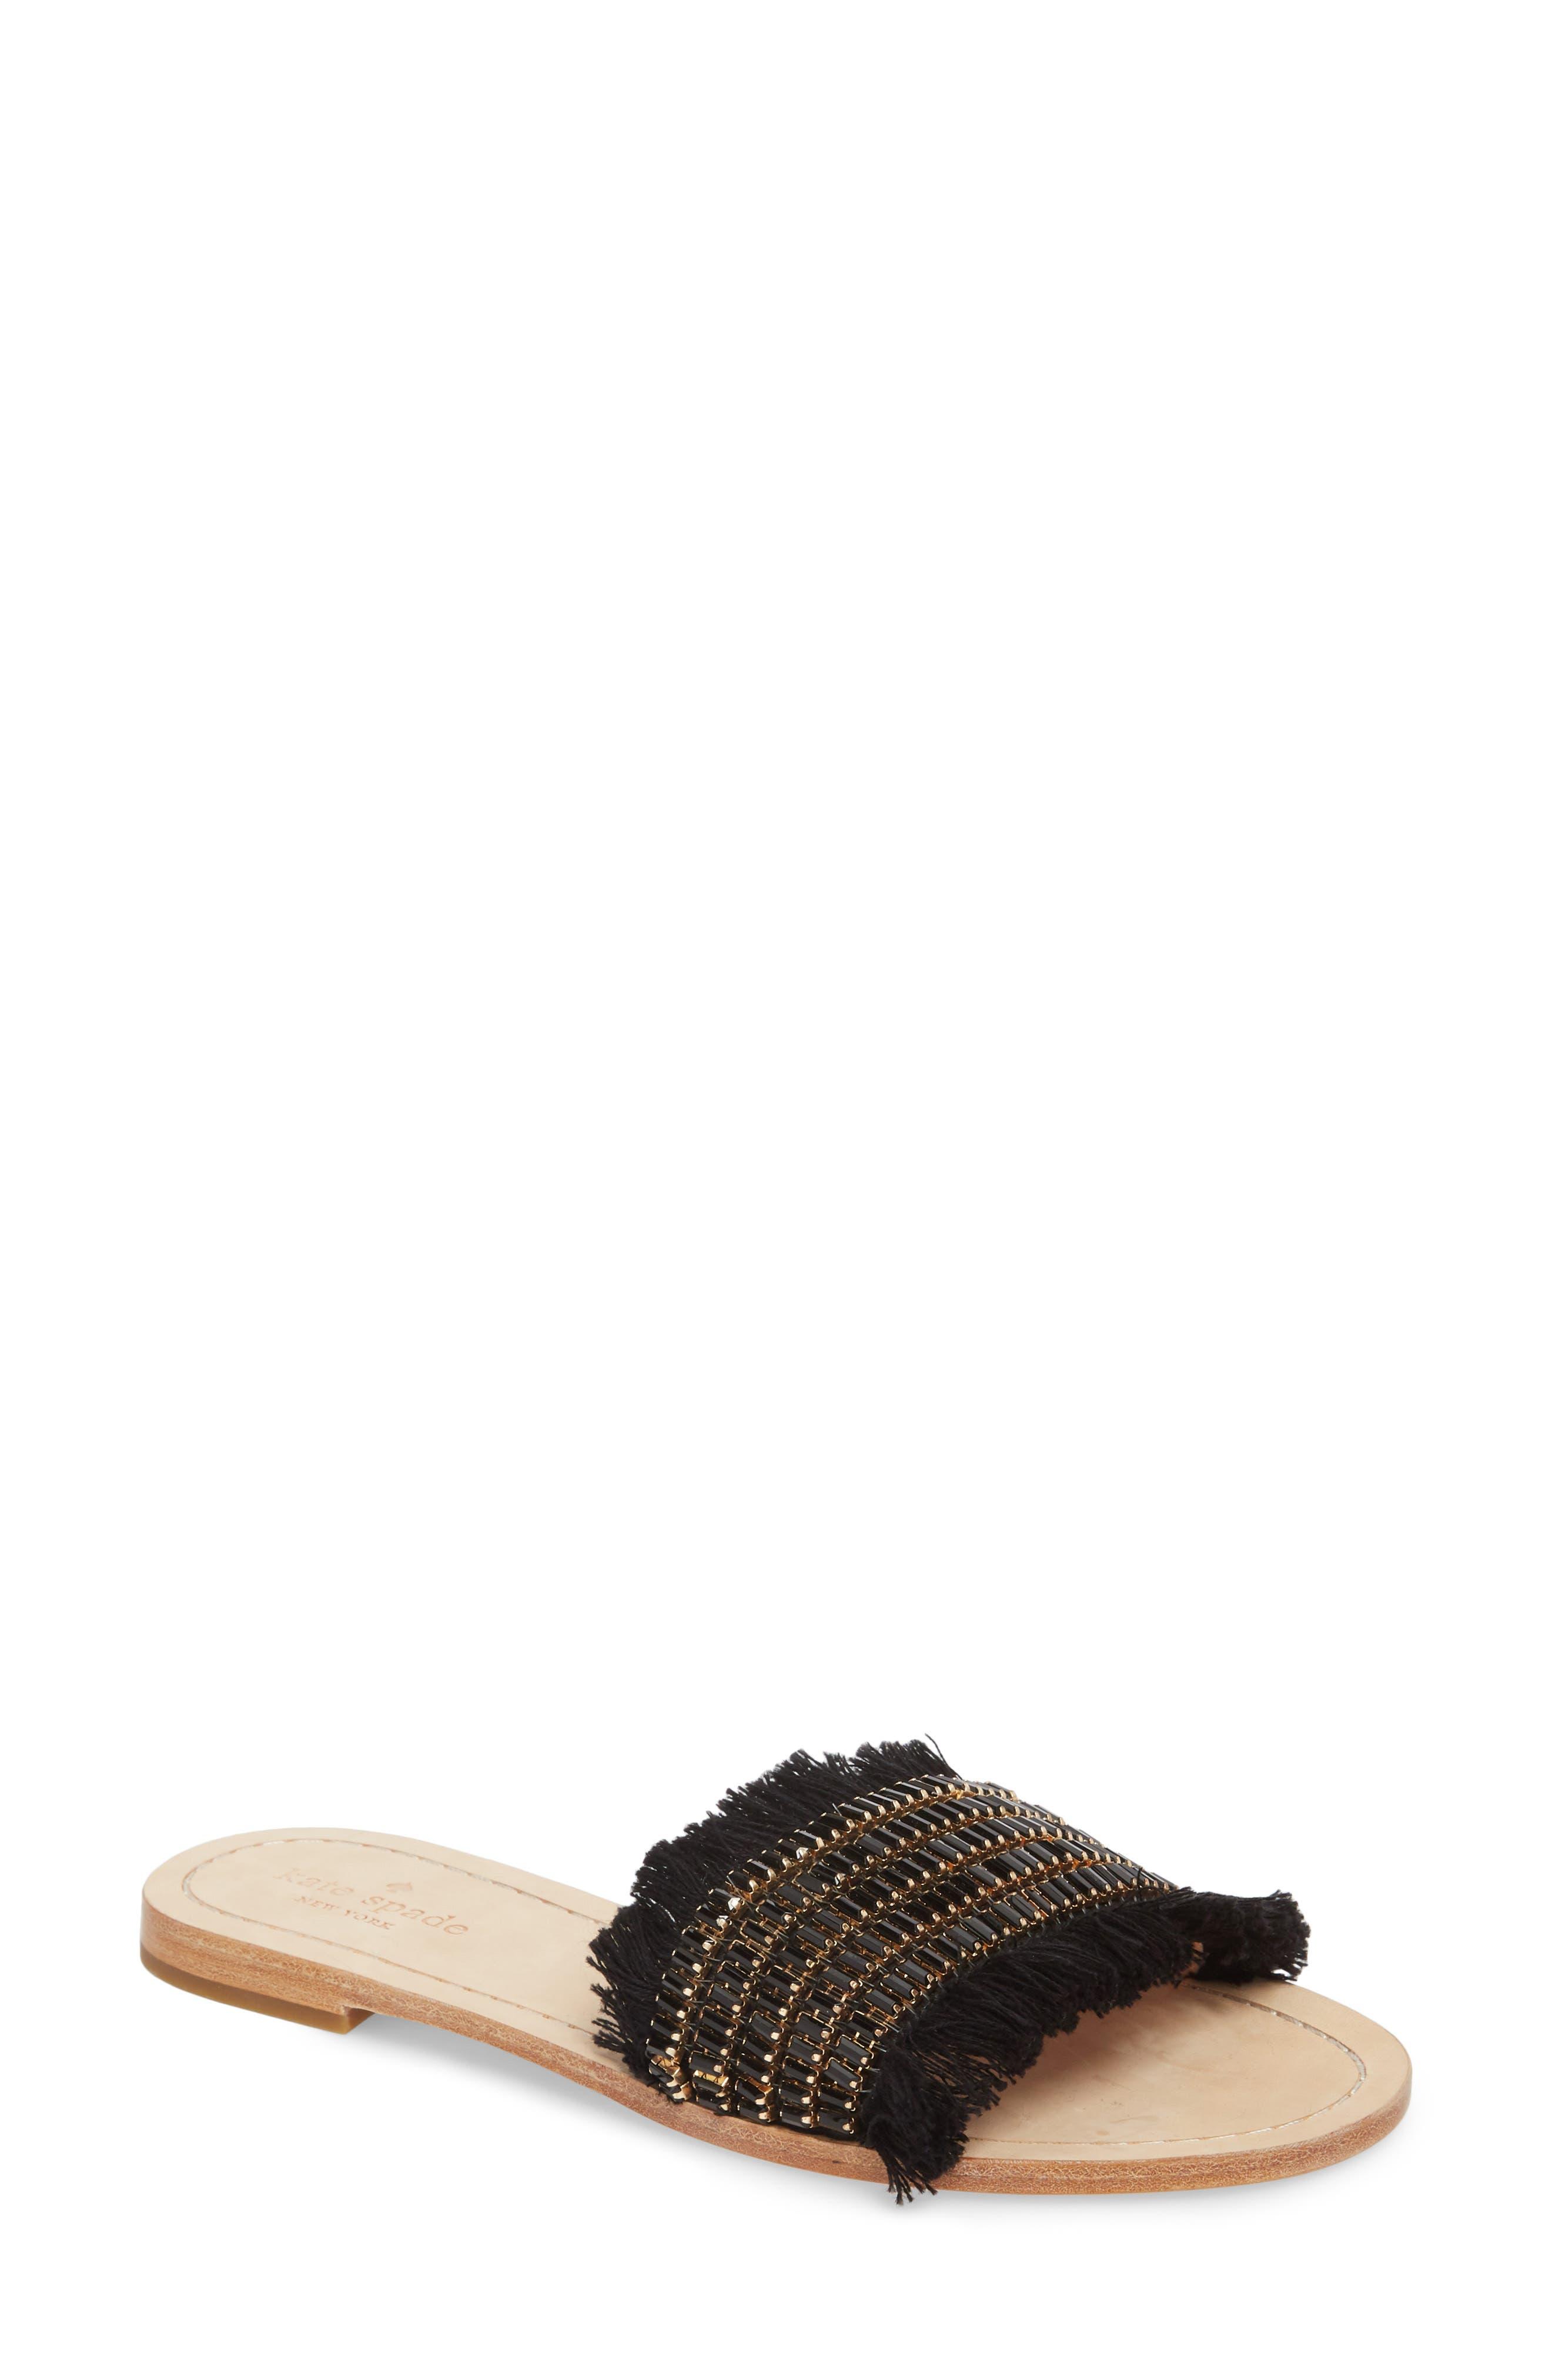 solaina slide sandal,                         Main,                         color,